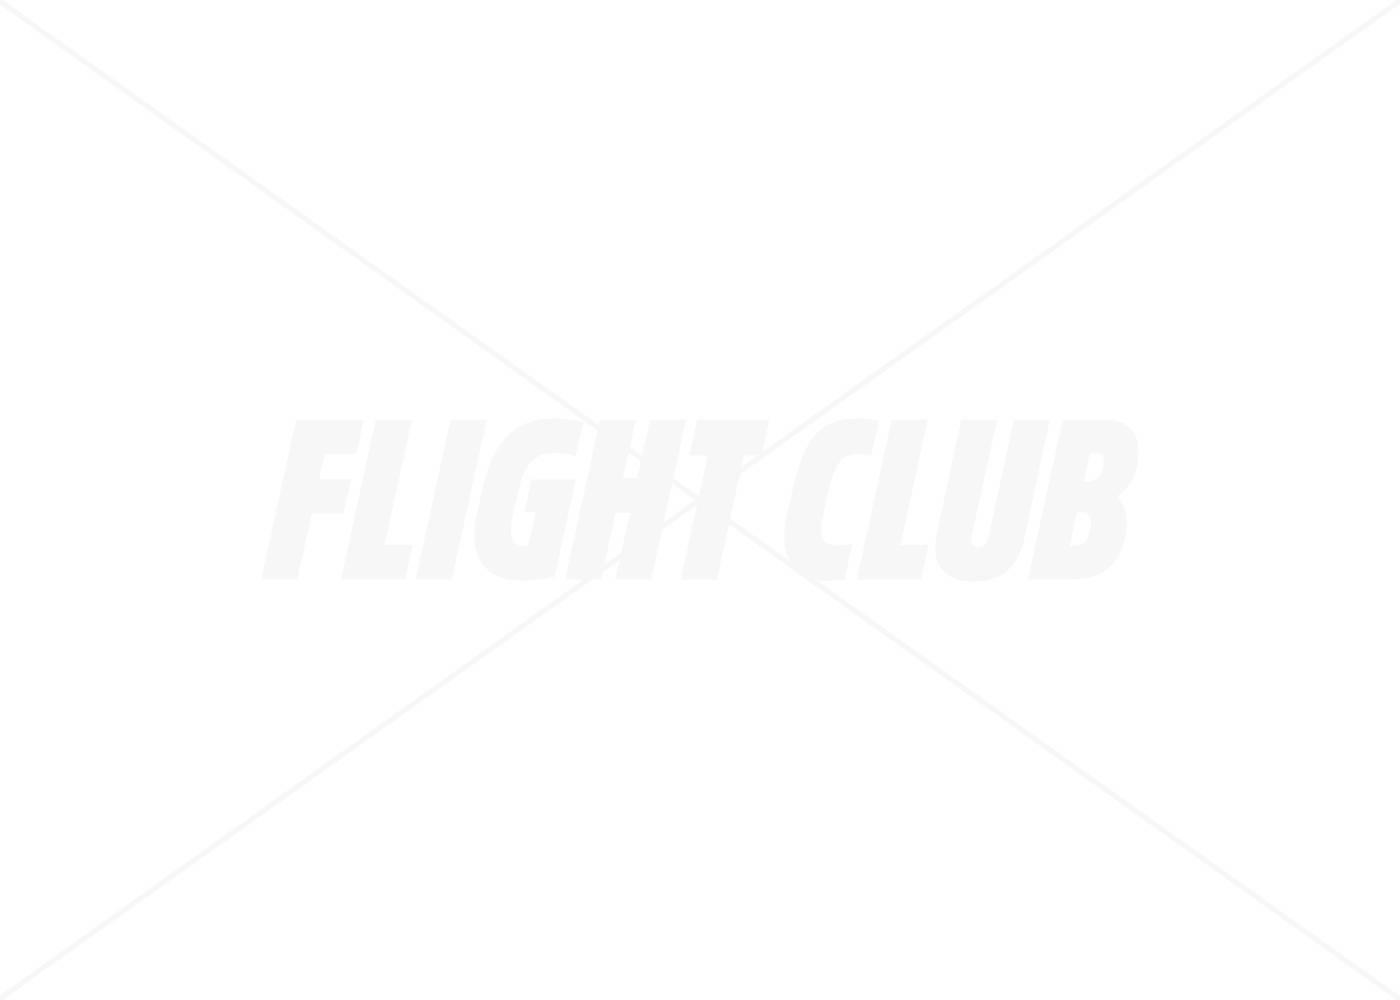 3bdc016708e275 Air Jordan 5 Retro - Air Jordan - 136027 051 - dark stucco university red